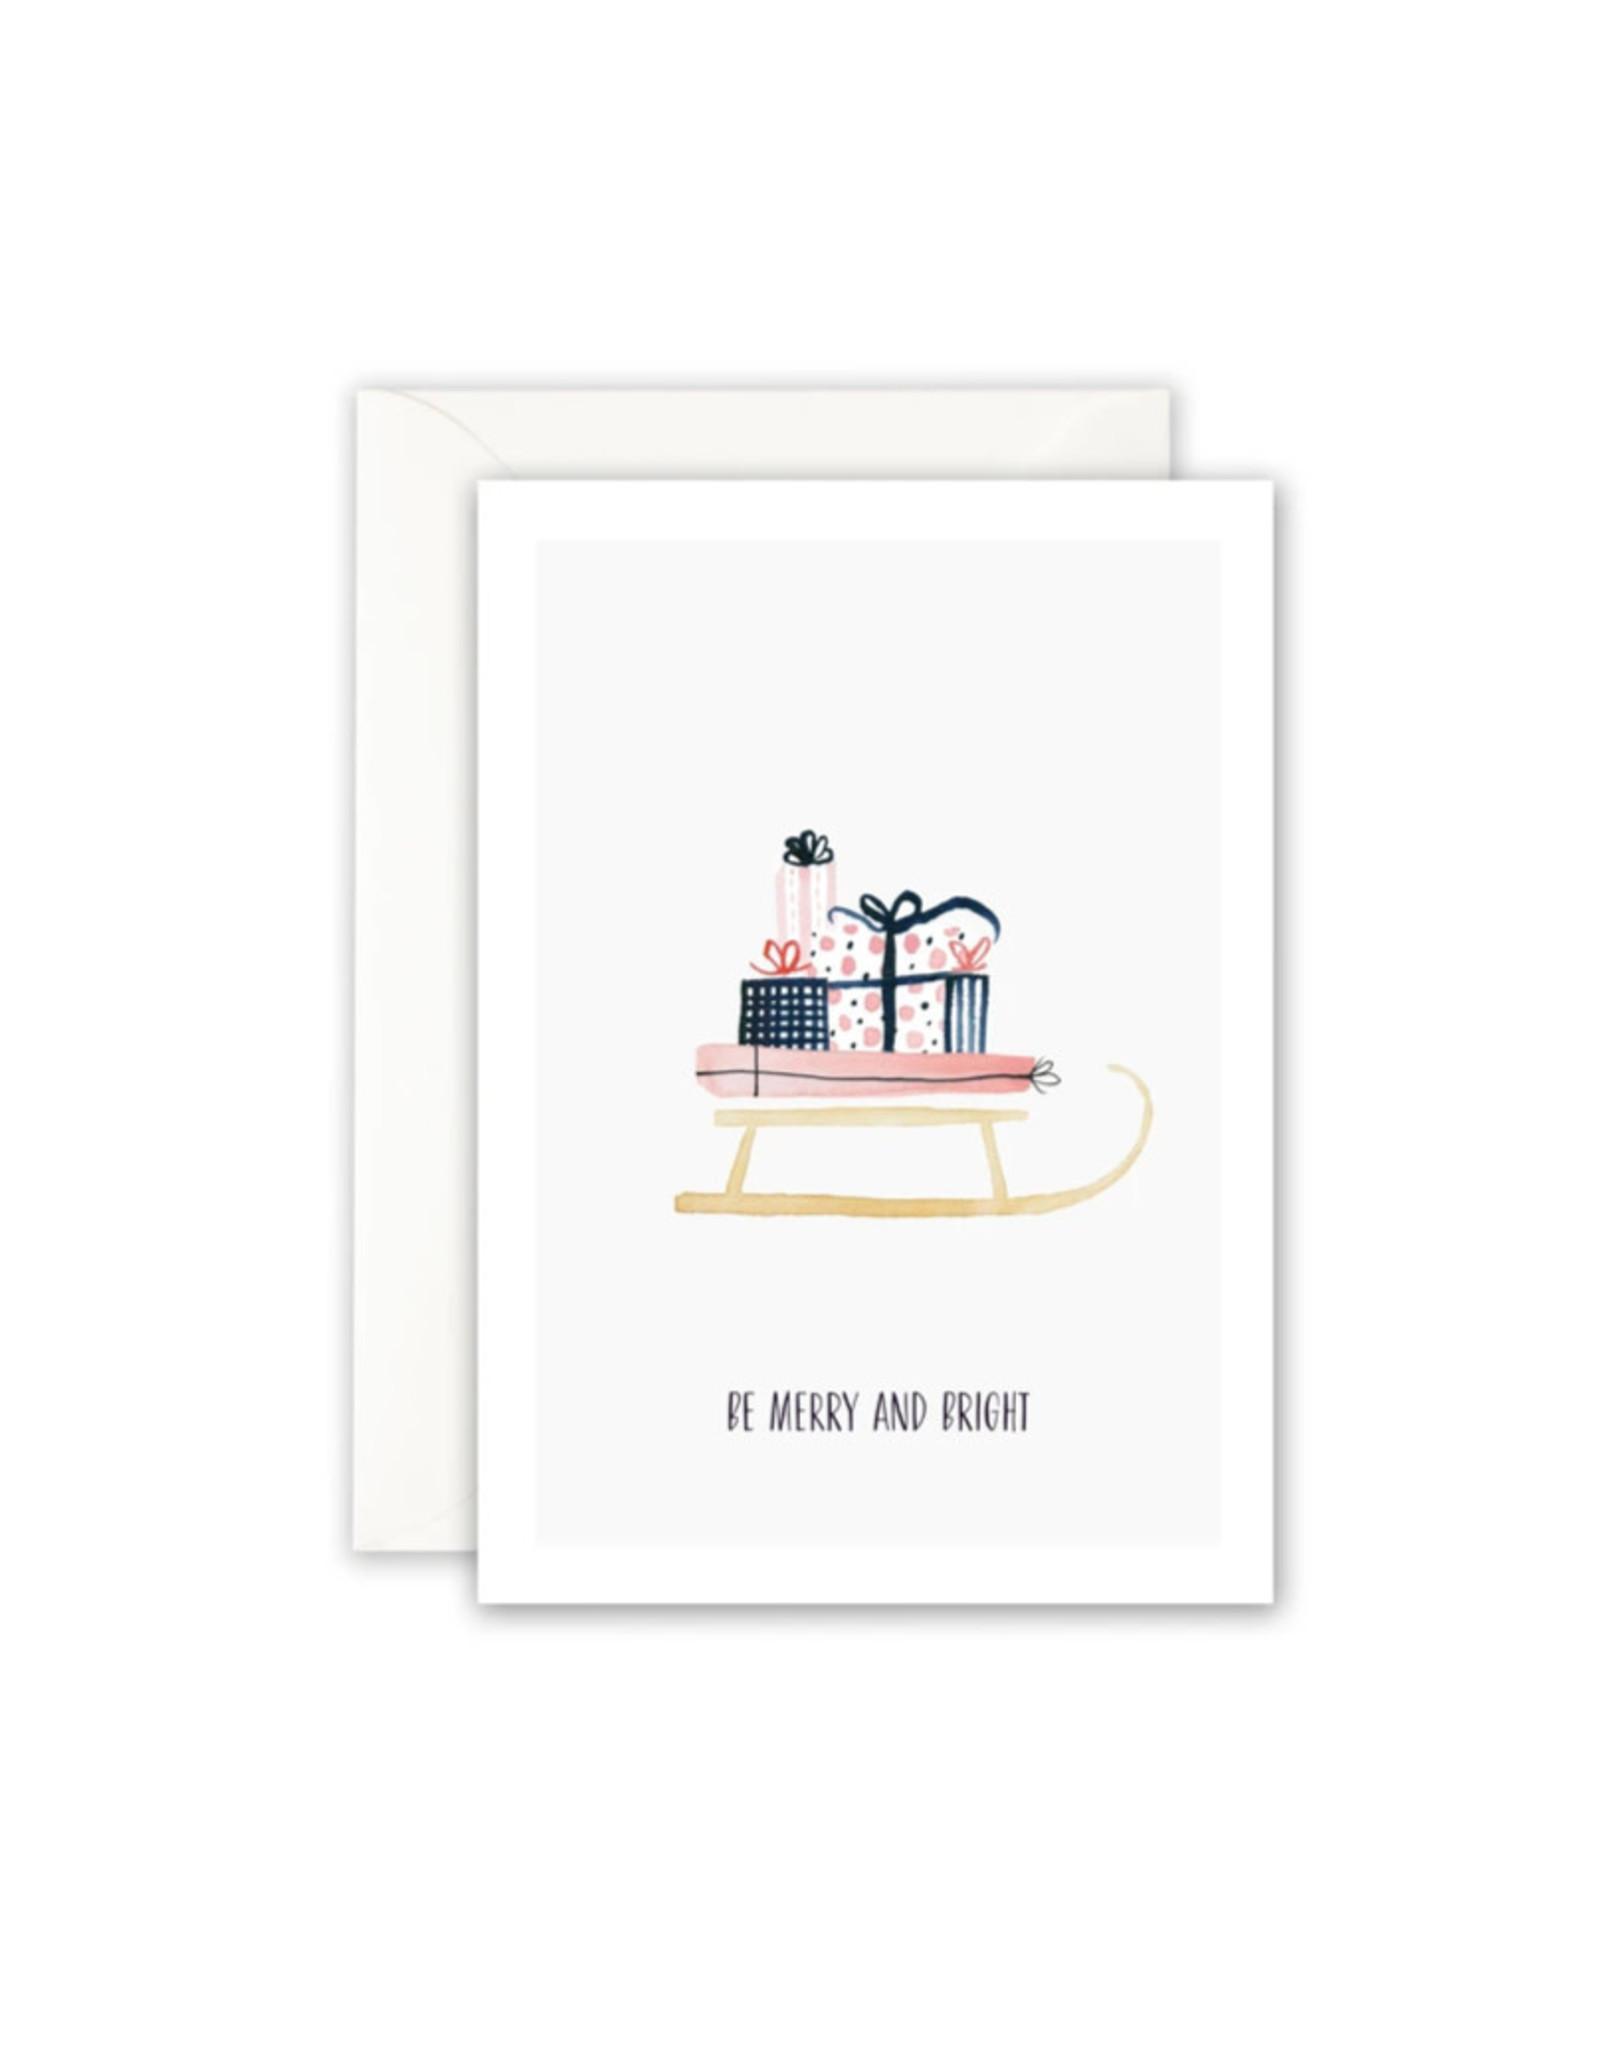 Leo La Douce Wenskaart - Kerst - Be merry and bright - Dubbele kaart + Envelope - 10 x 15cm